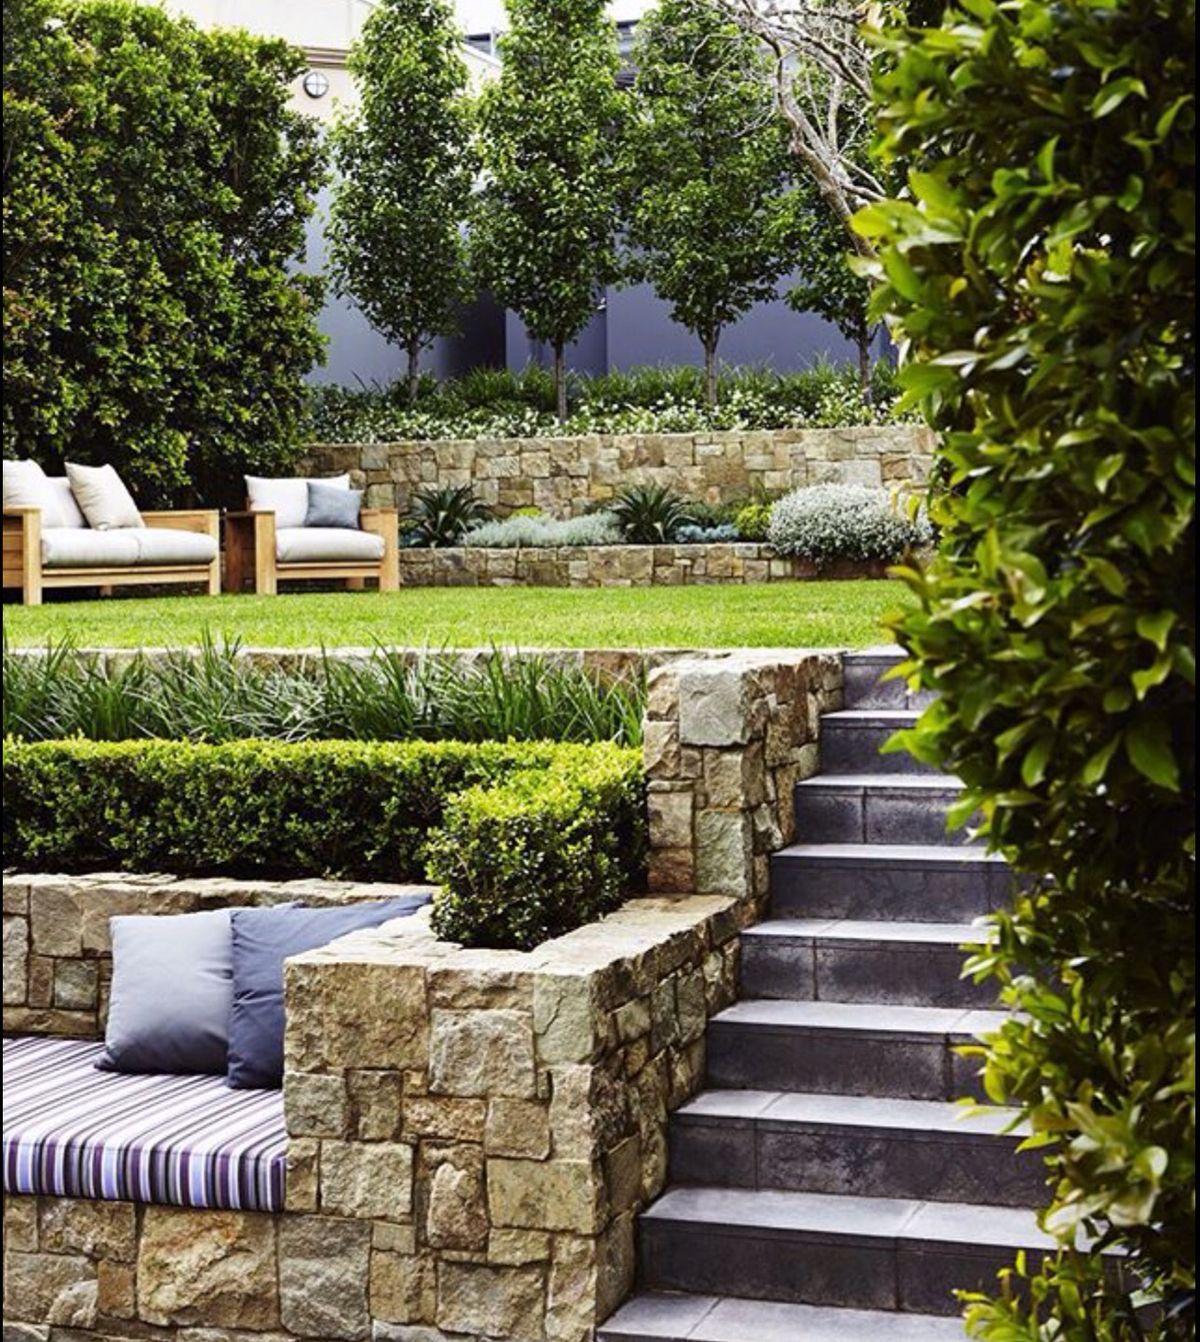 Jard n con desniveles escaleras pinterest jard n for Ideas de jardines exteriores